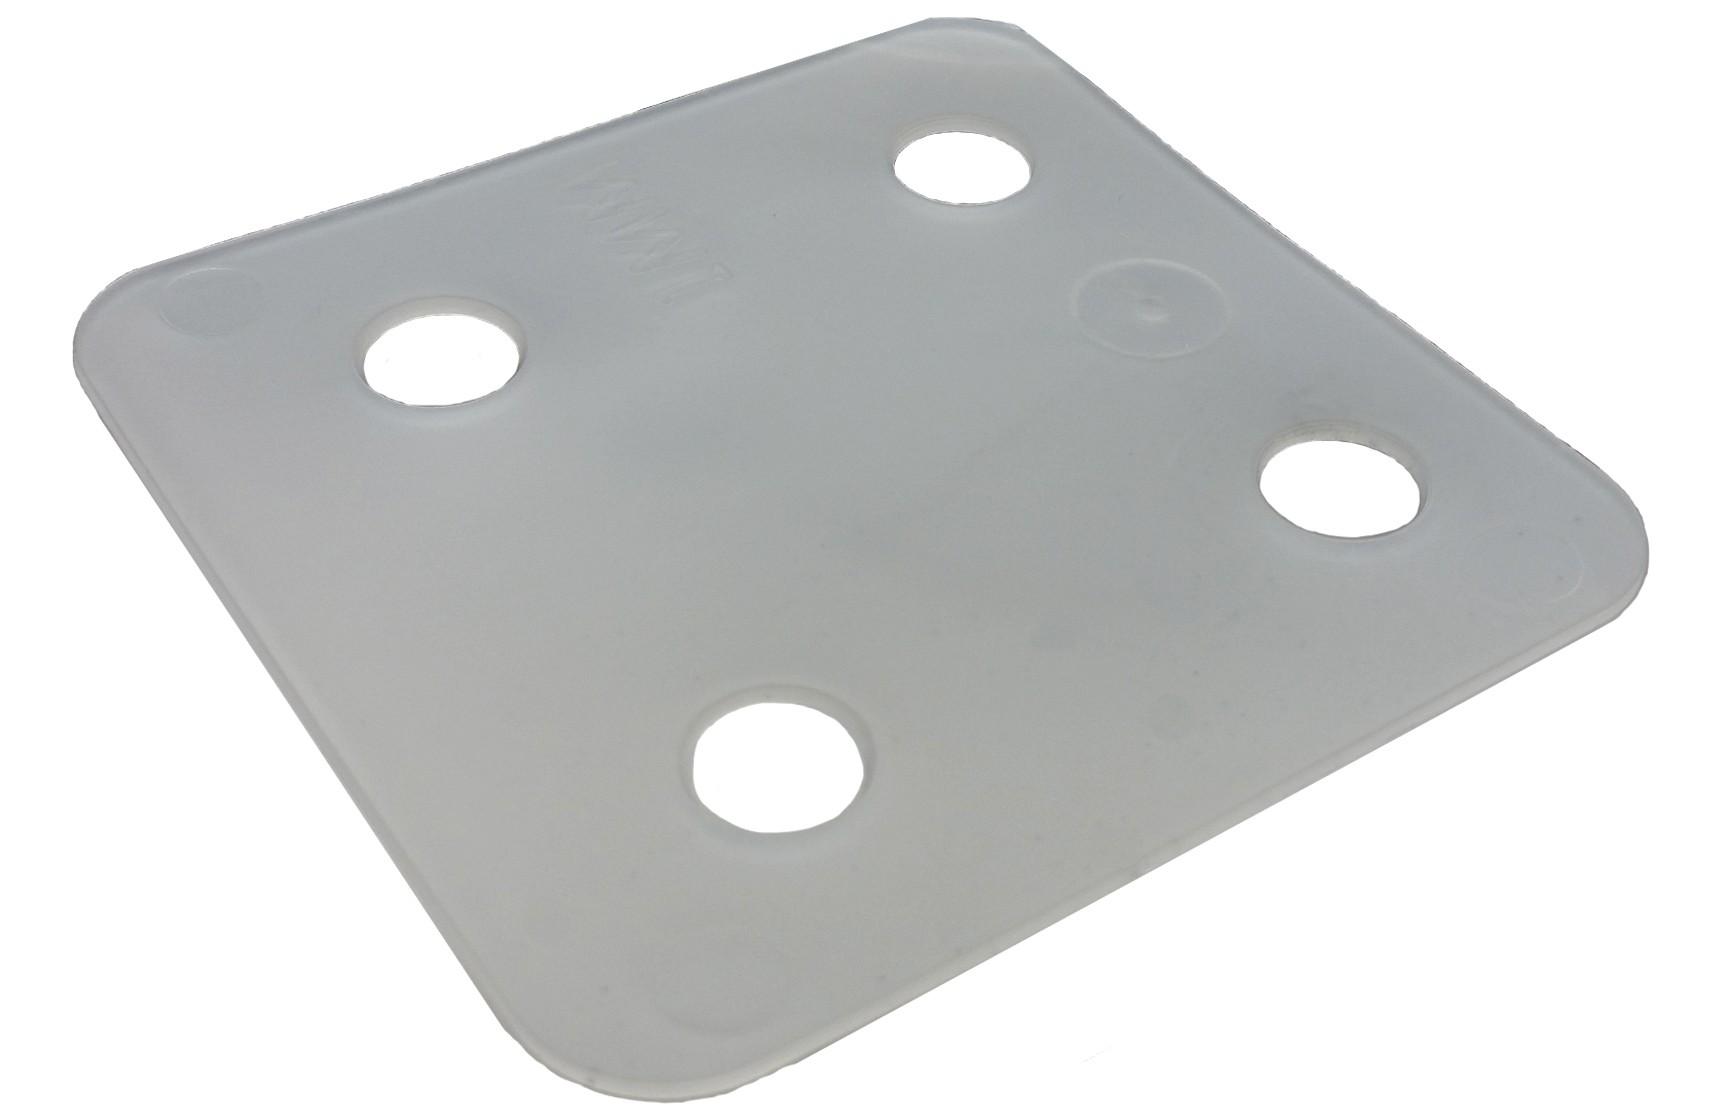 Pressure plate 1 70x70 KS